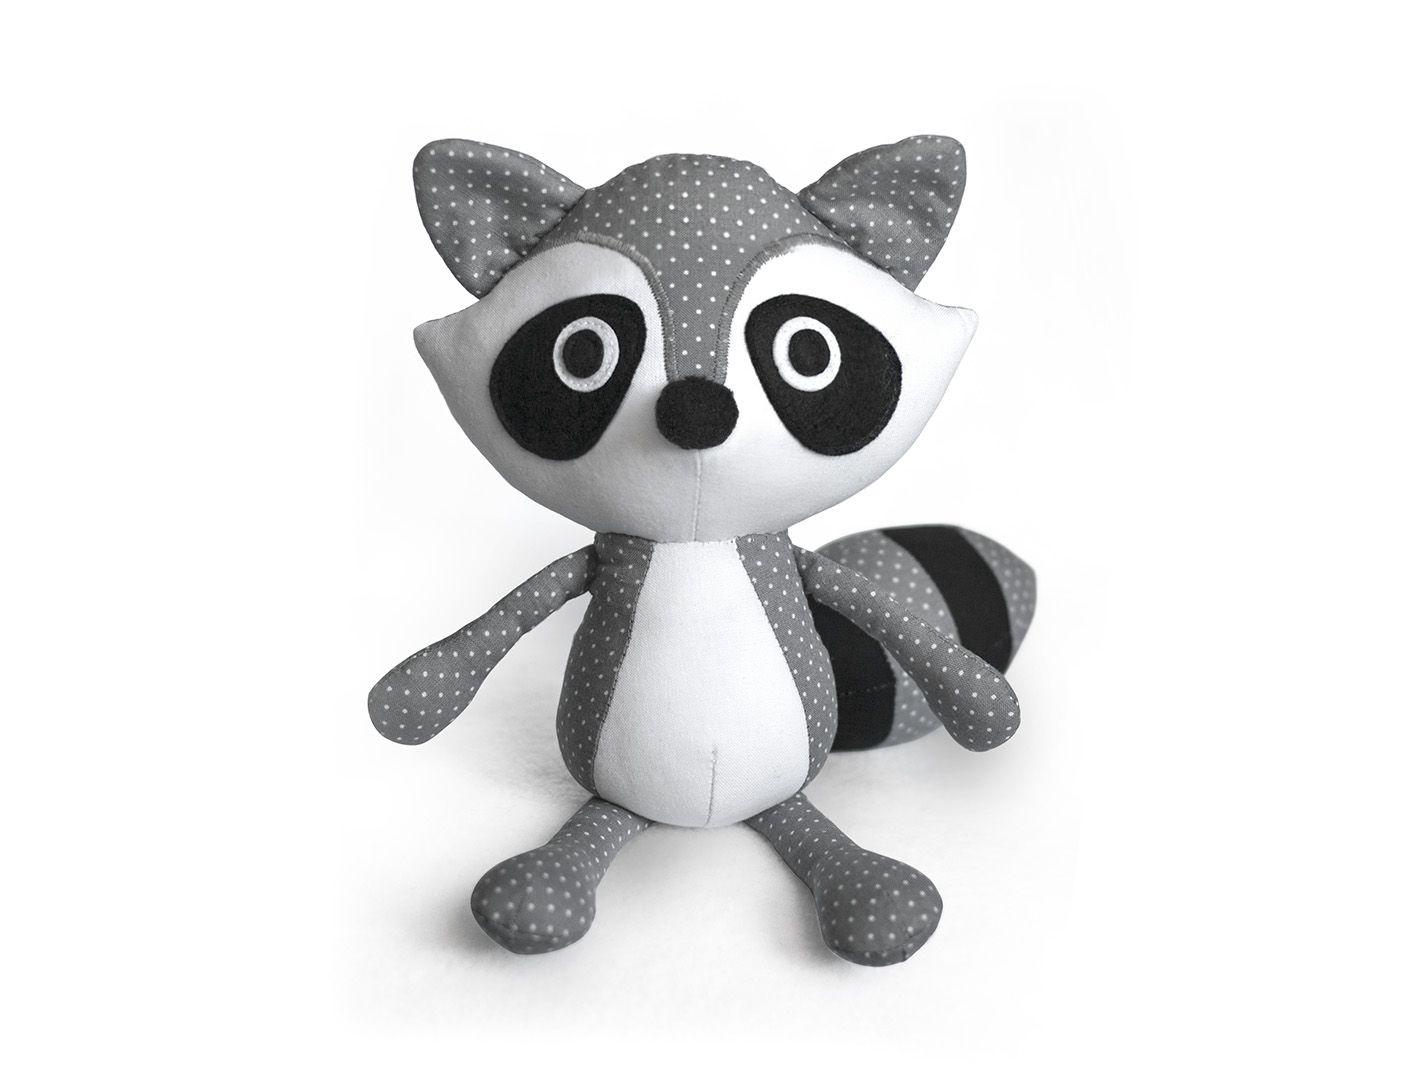 Mariska's Blog - designer of Fluffels and DIY Fluffies. Mariska makes cute soft toy sewing & crochet patterns and adorable stuffed animals.